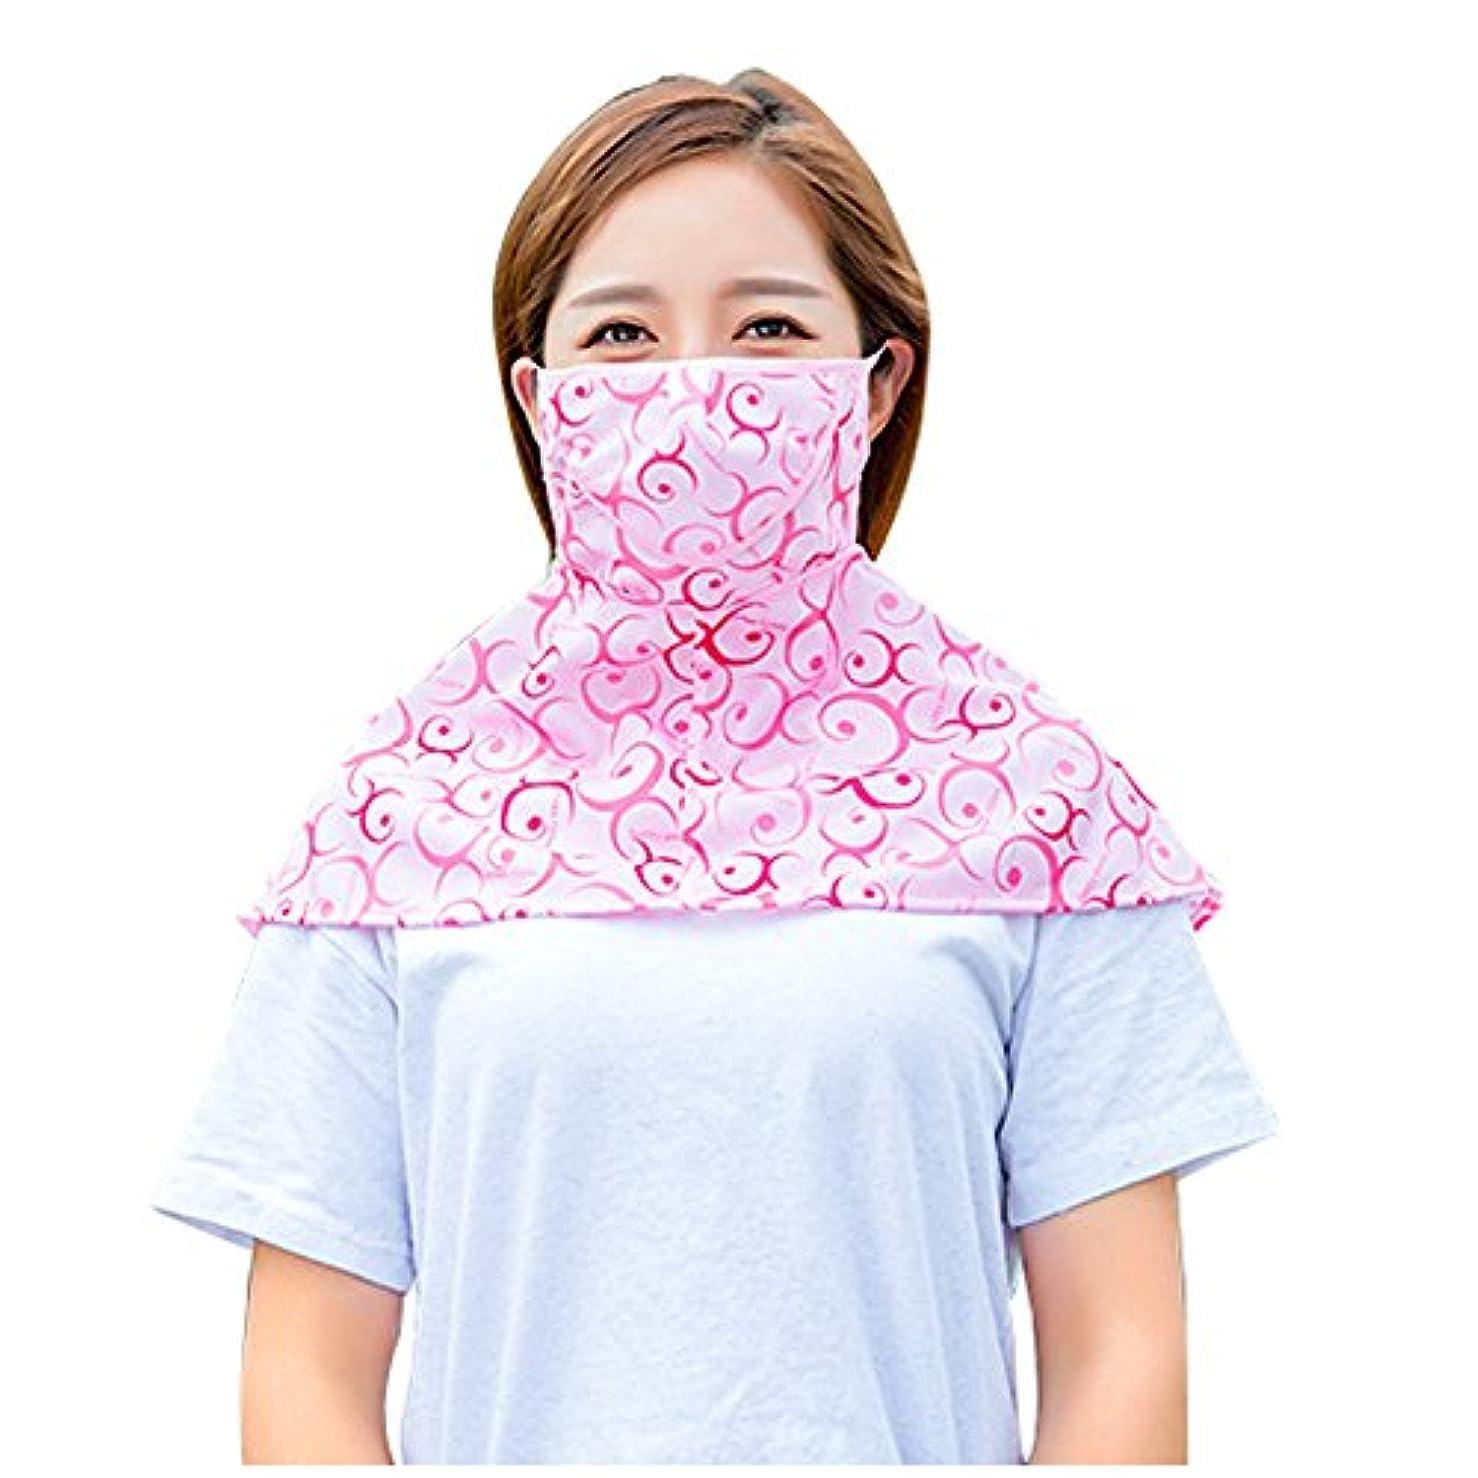 PureNicot 日焼け防止 フェイスマスク UVカット 紫外線対策 農作業 ガーデニング レディース 首もともガード 3D UVマスク (ピンク 模様)